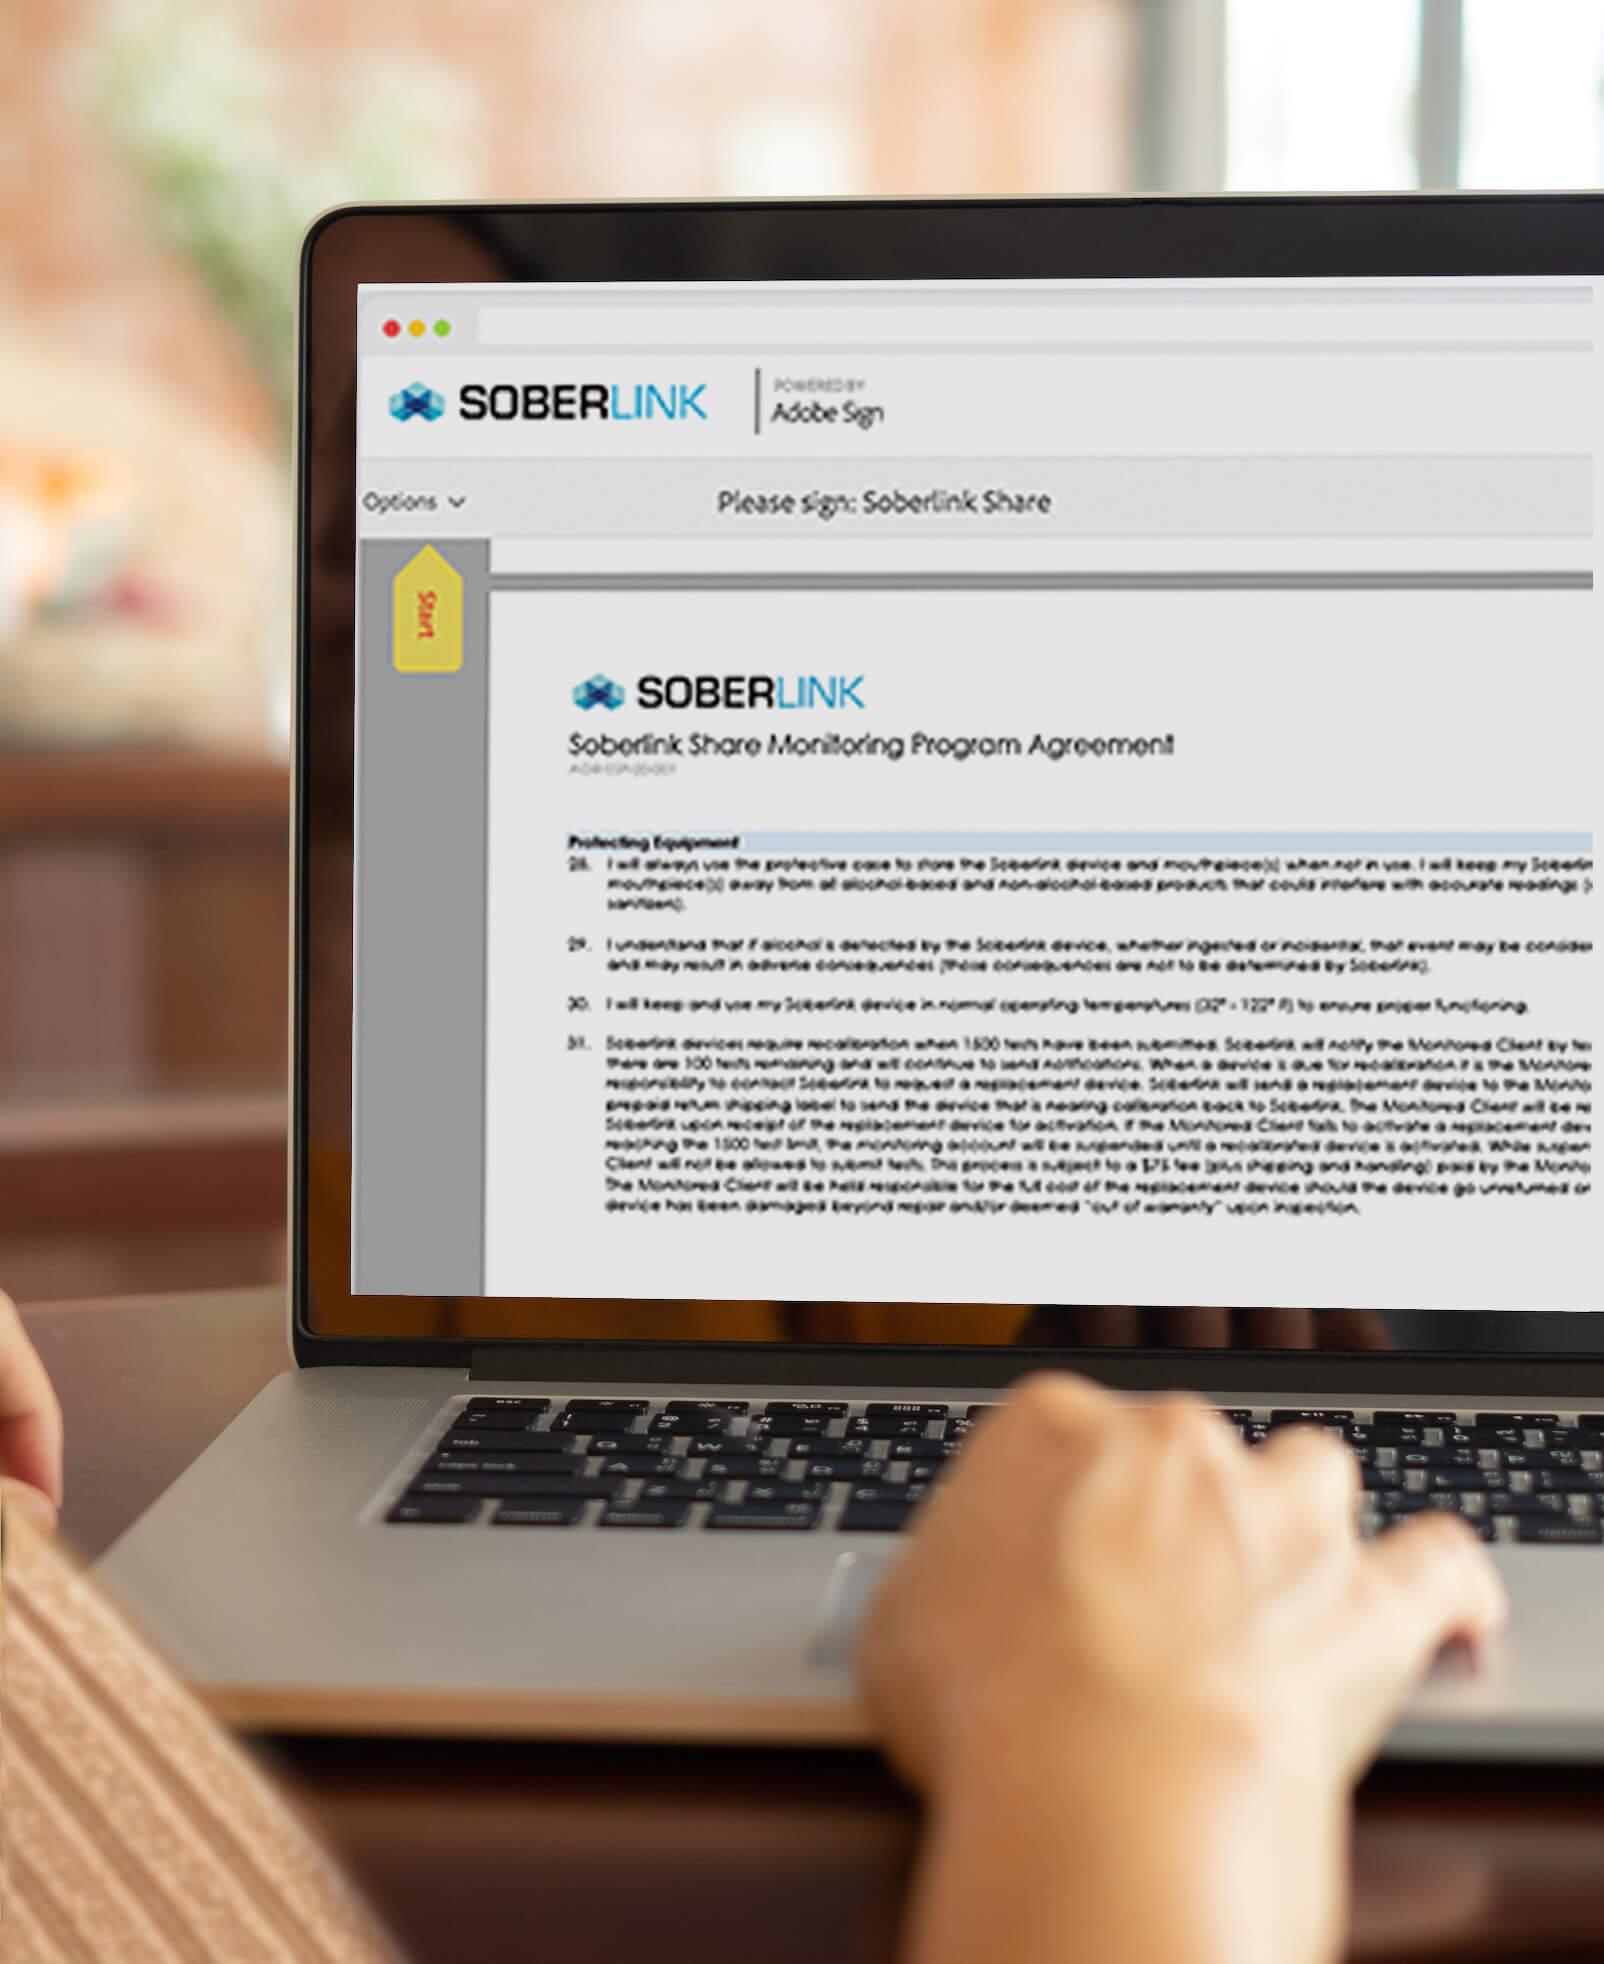 Soberlink Monitoring Program Agreement